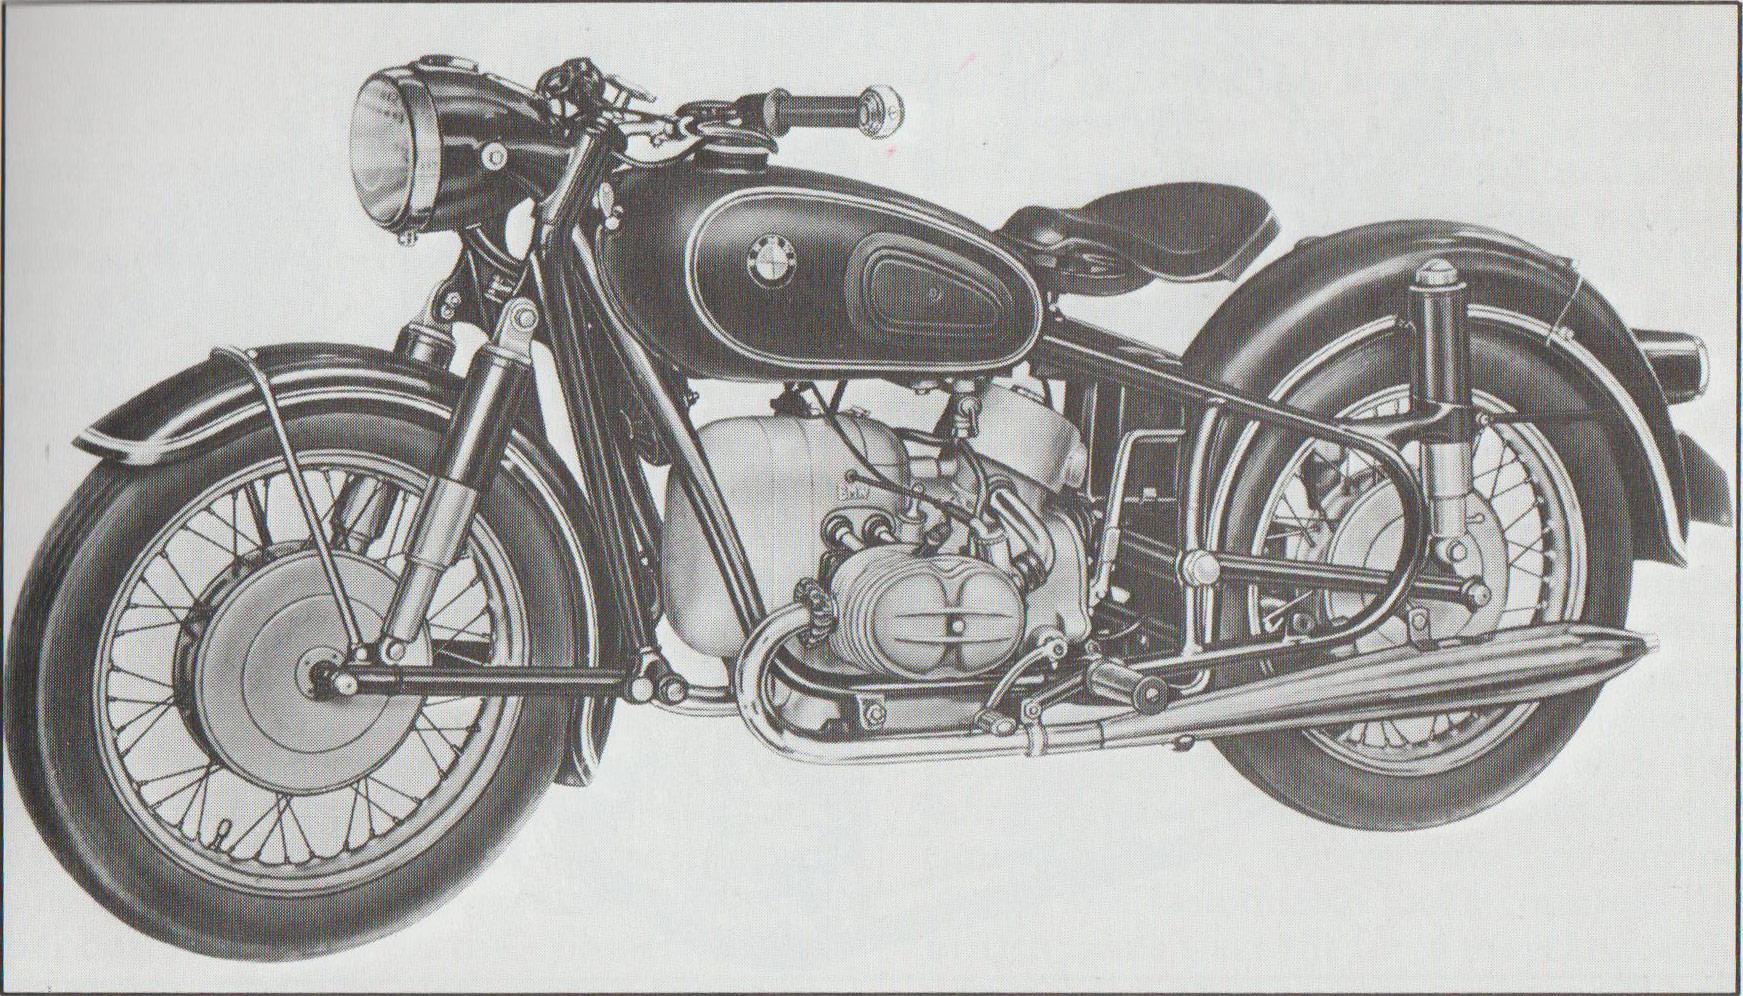 1960 BMW R50S